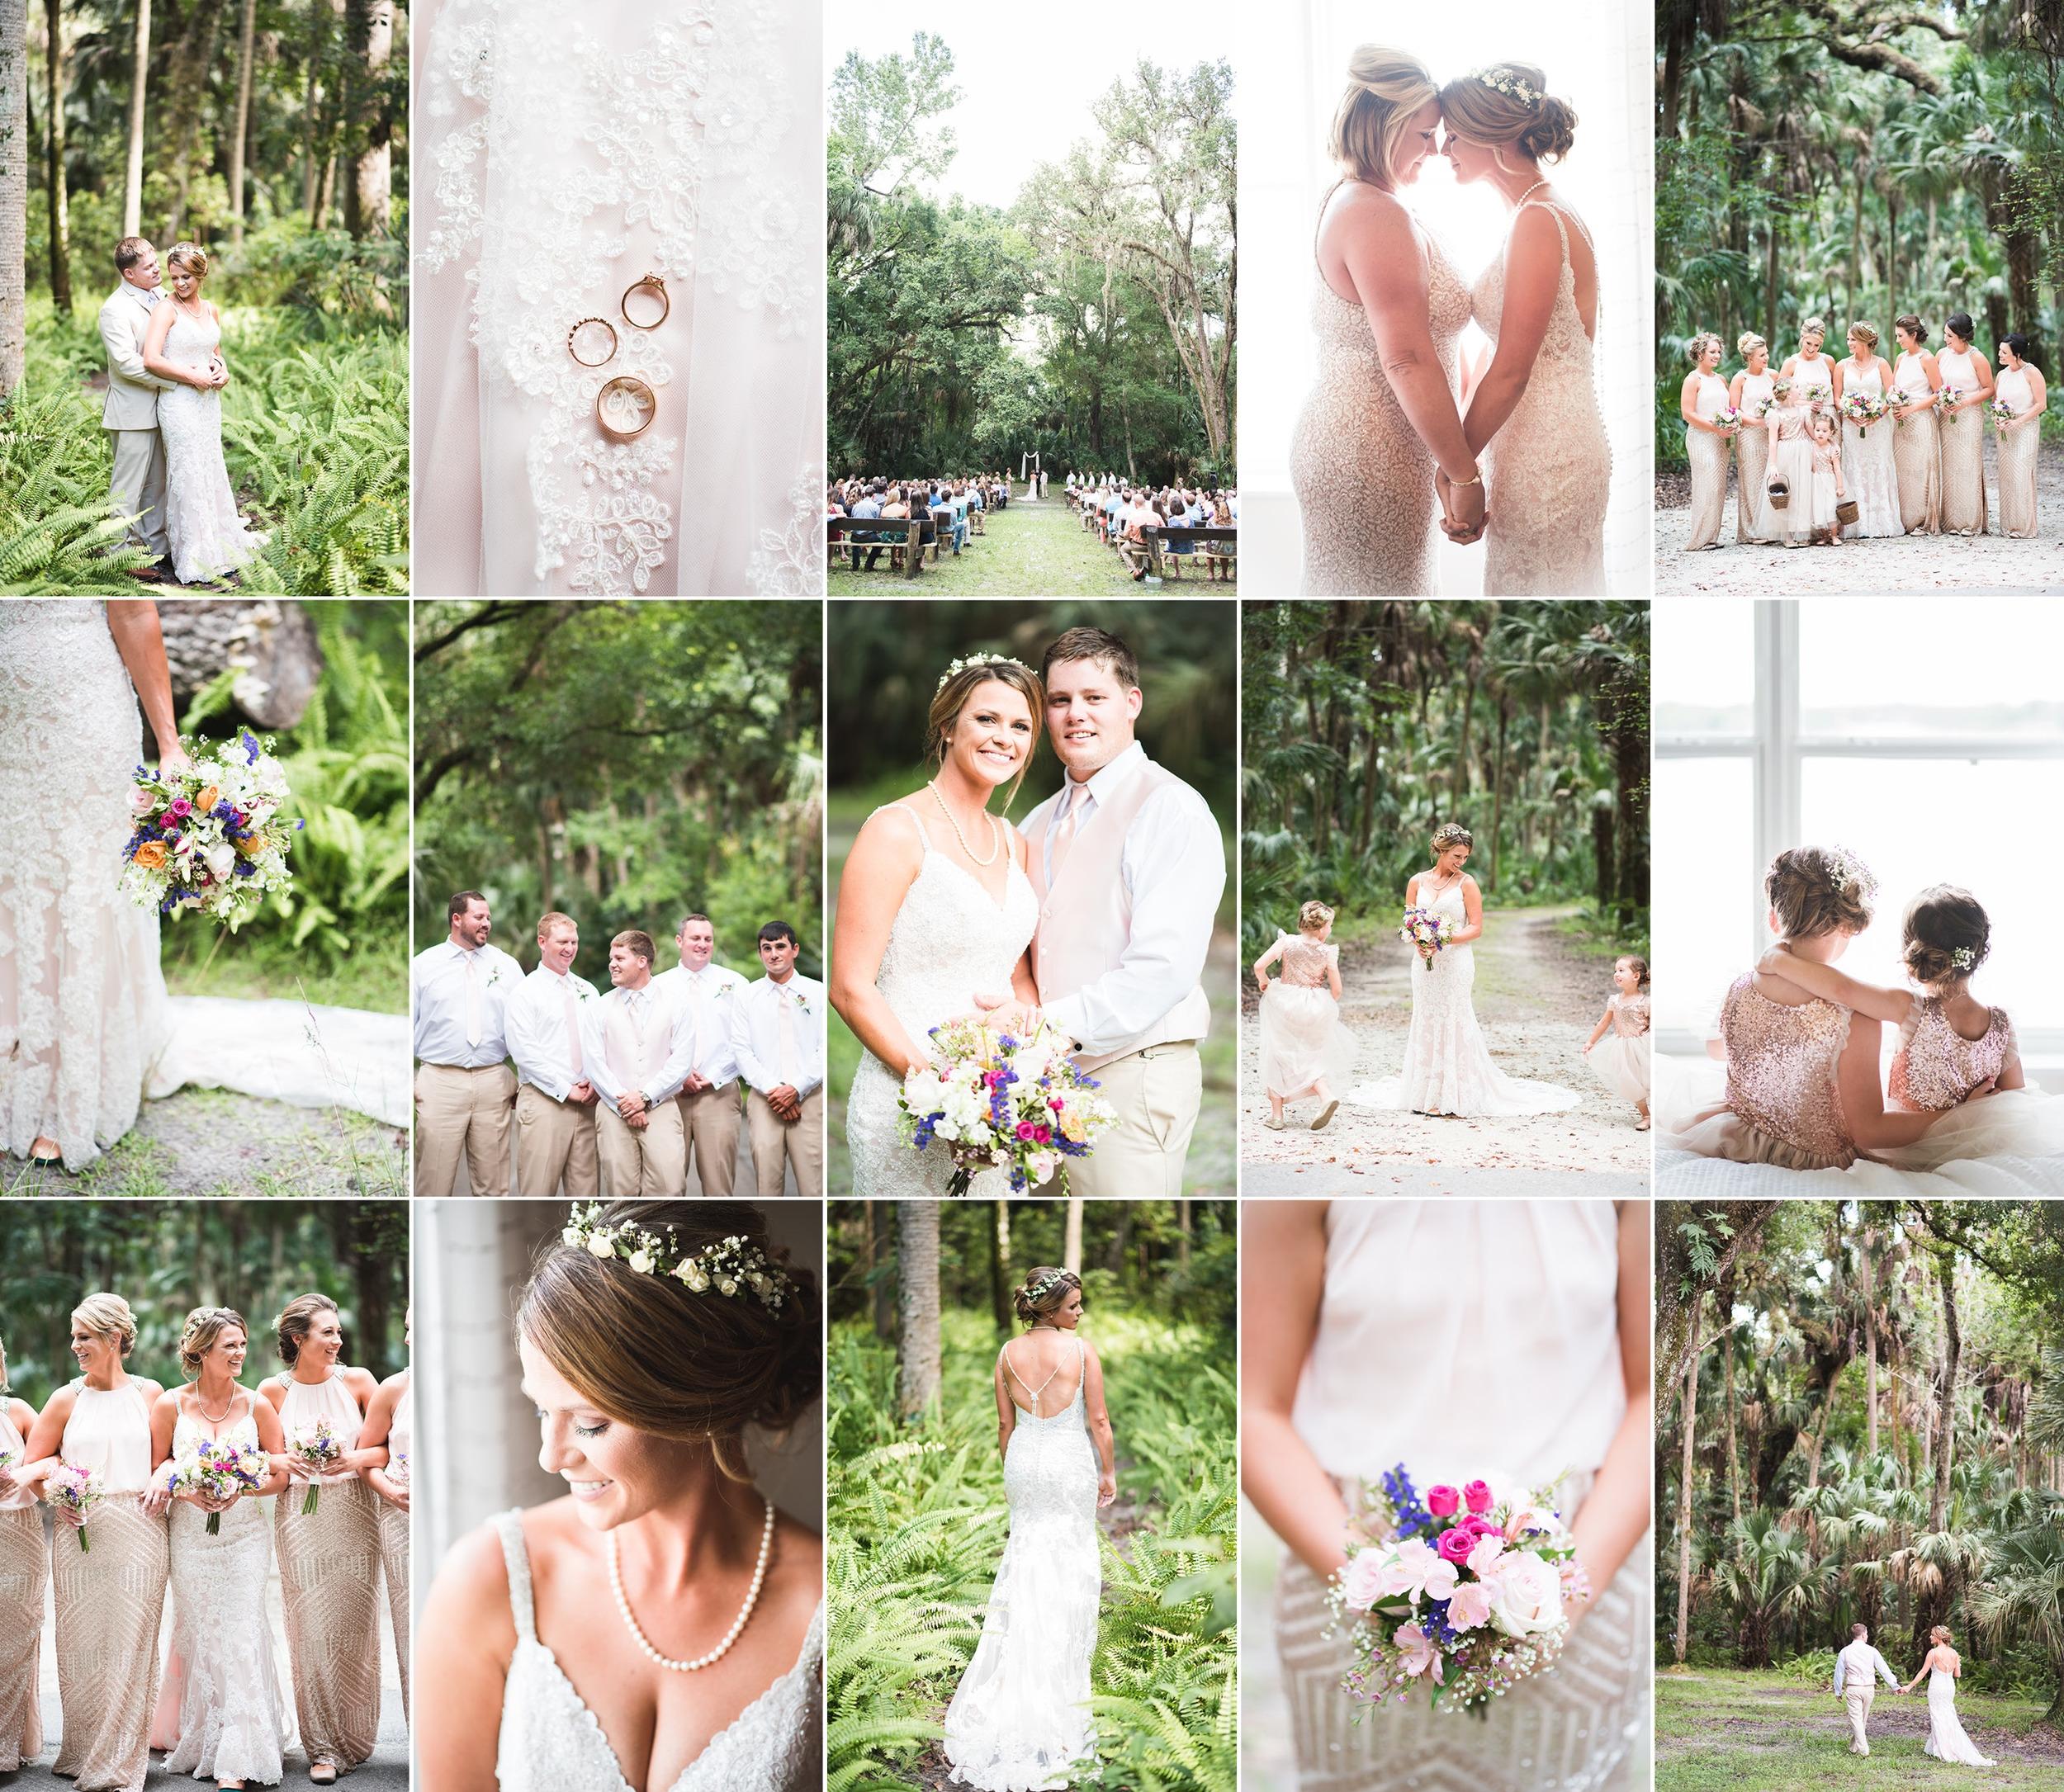 Sam + Grady — Highlands Hammock State Park Wedding Photography in Sebring, FL